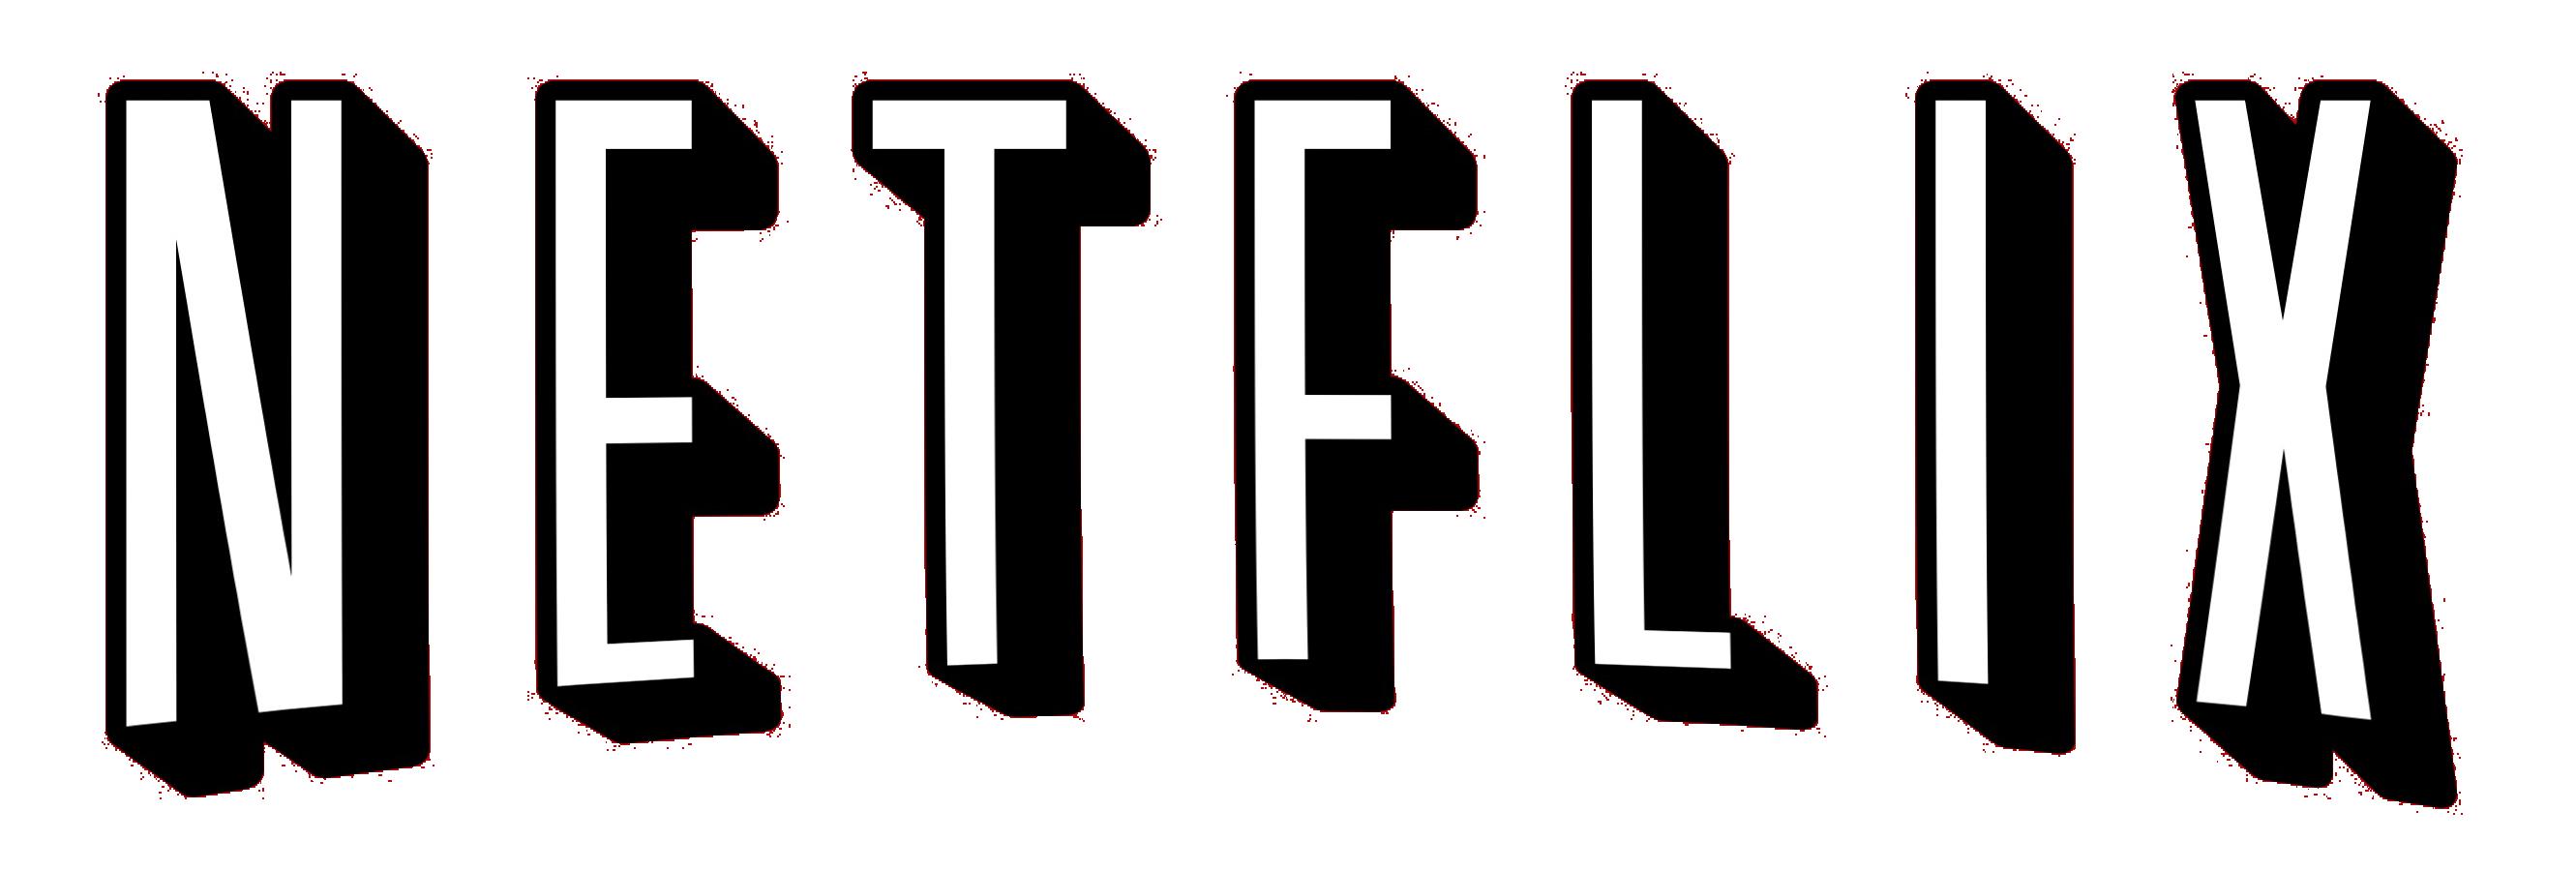 black netflix logo png #2565